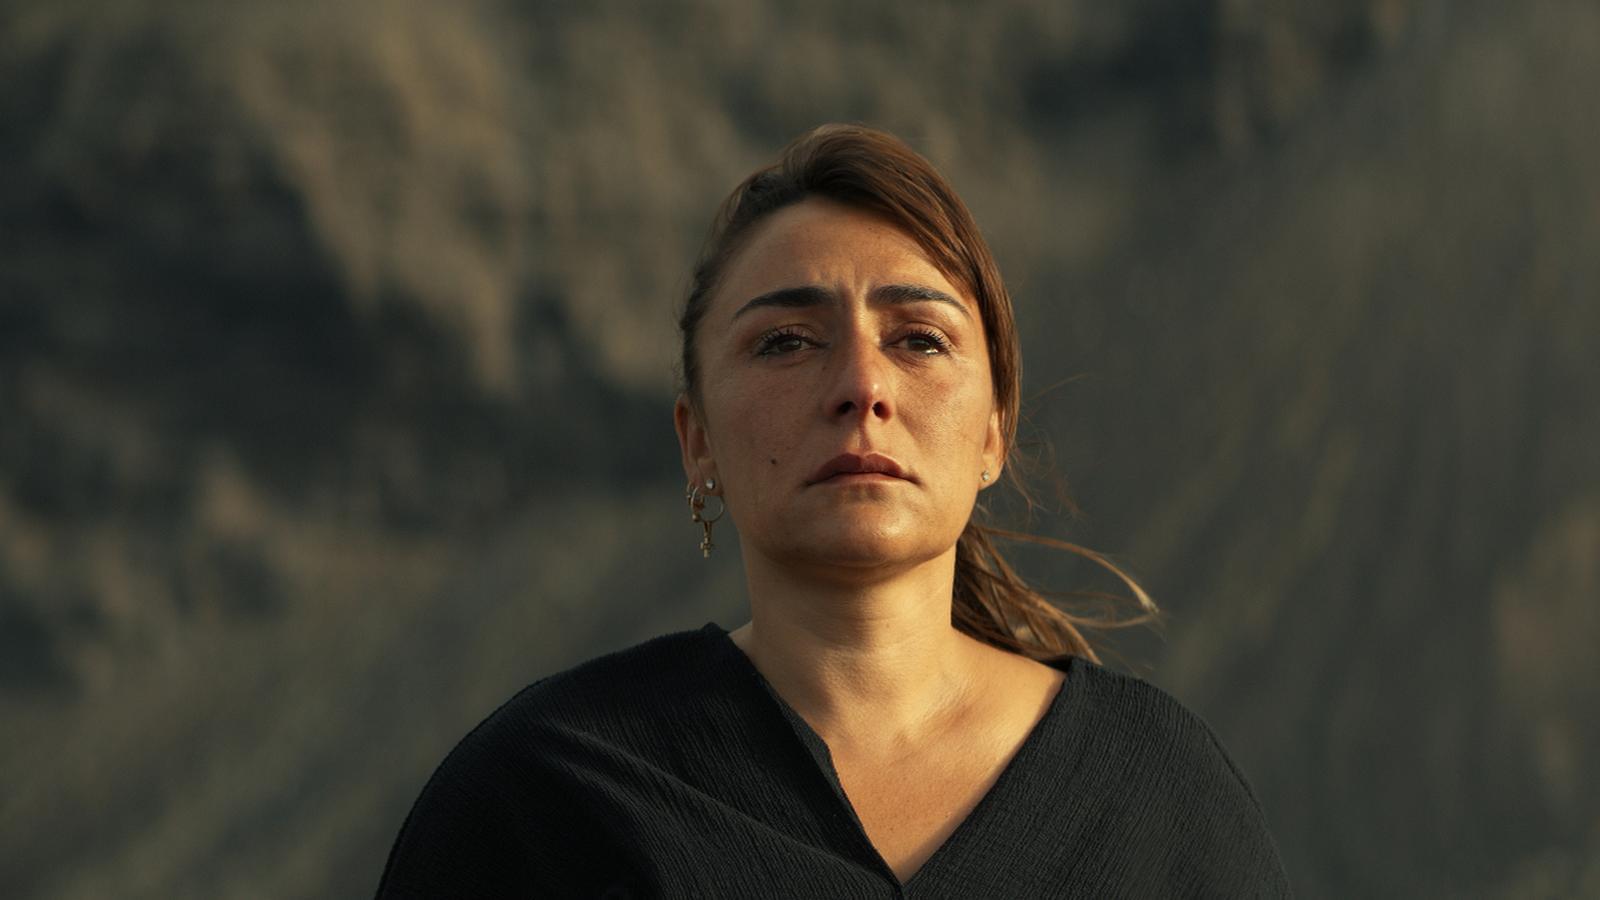 El 'thriller' 'Hierro', amb Candela Peña, tindrà una segona temporada